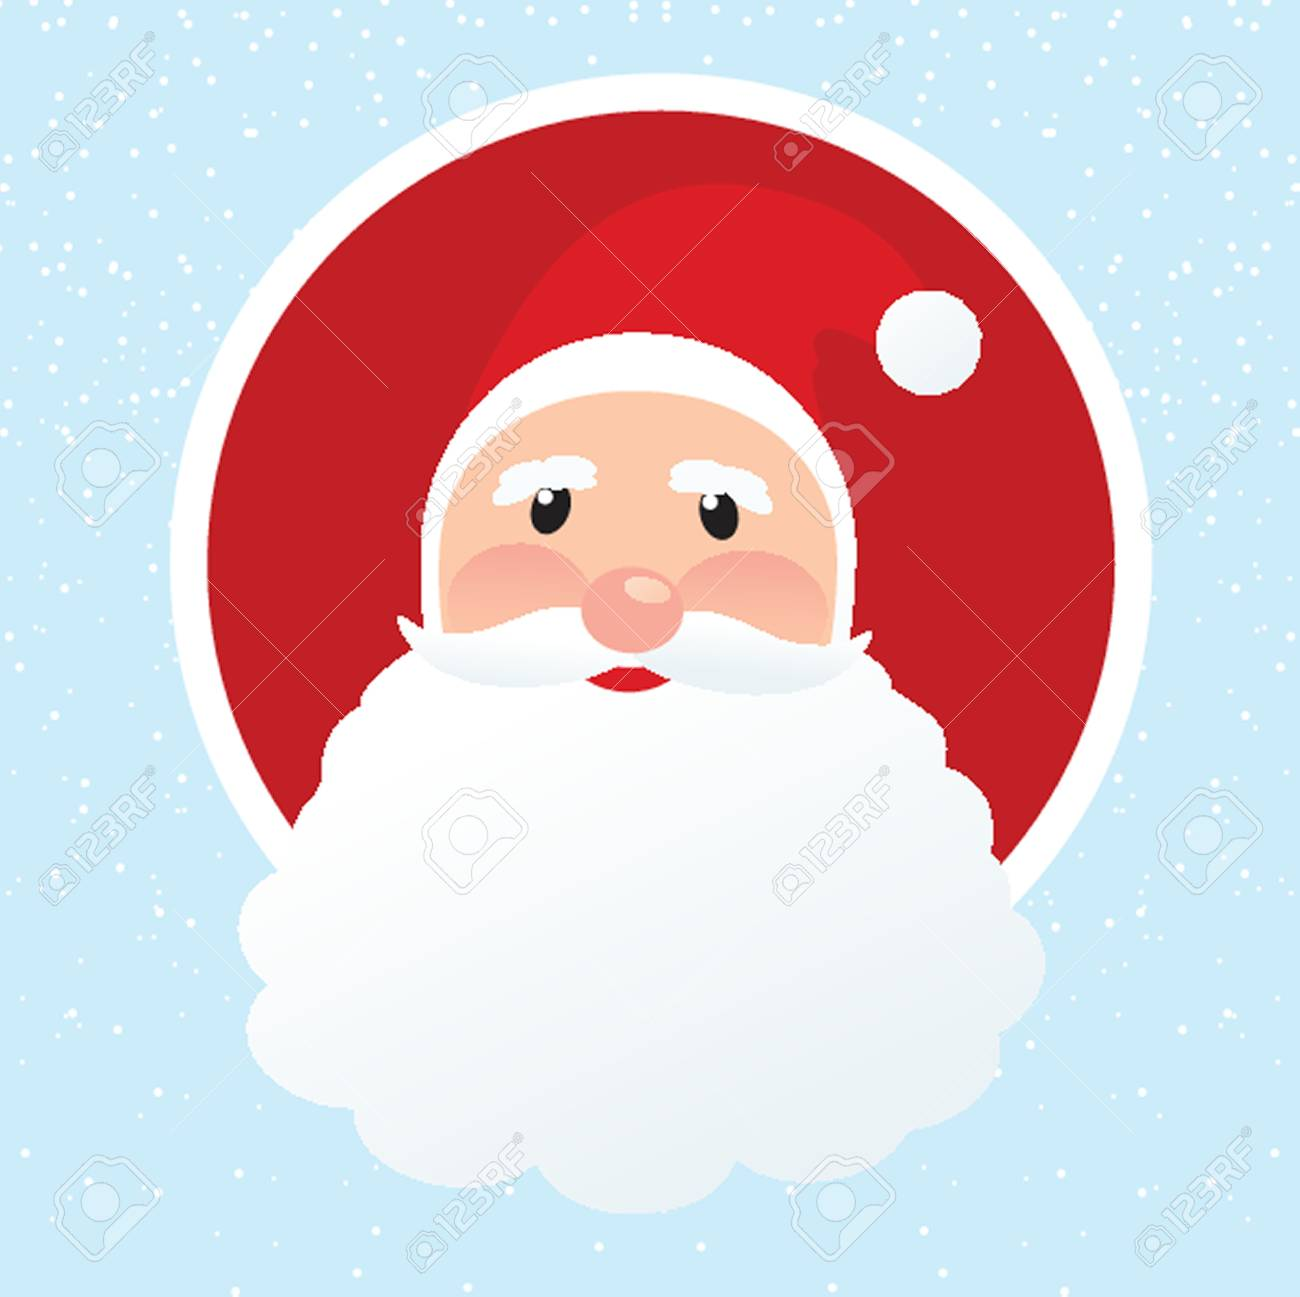 Christmas card with Santa Klaus face Stock Vector - 19218107